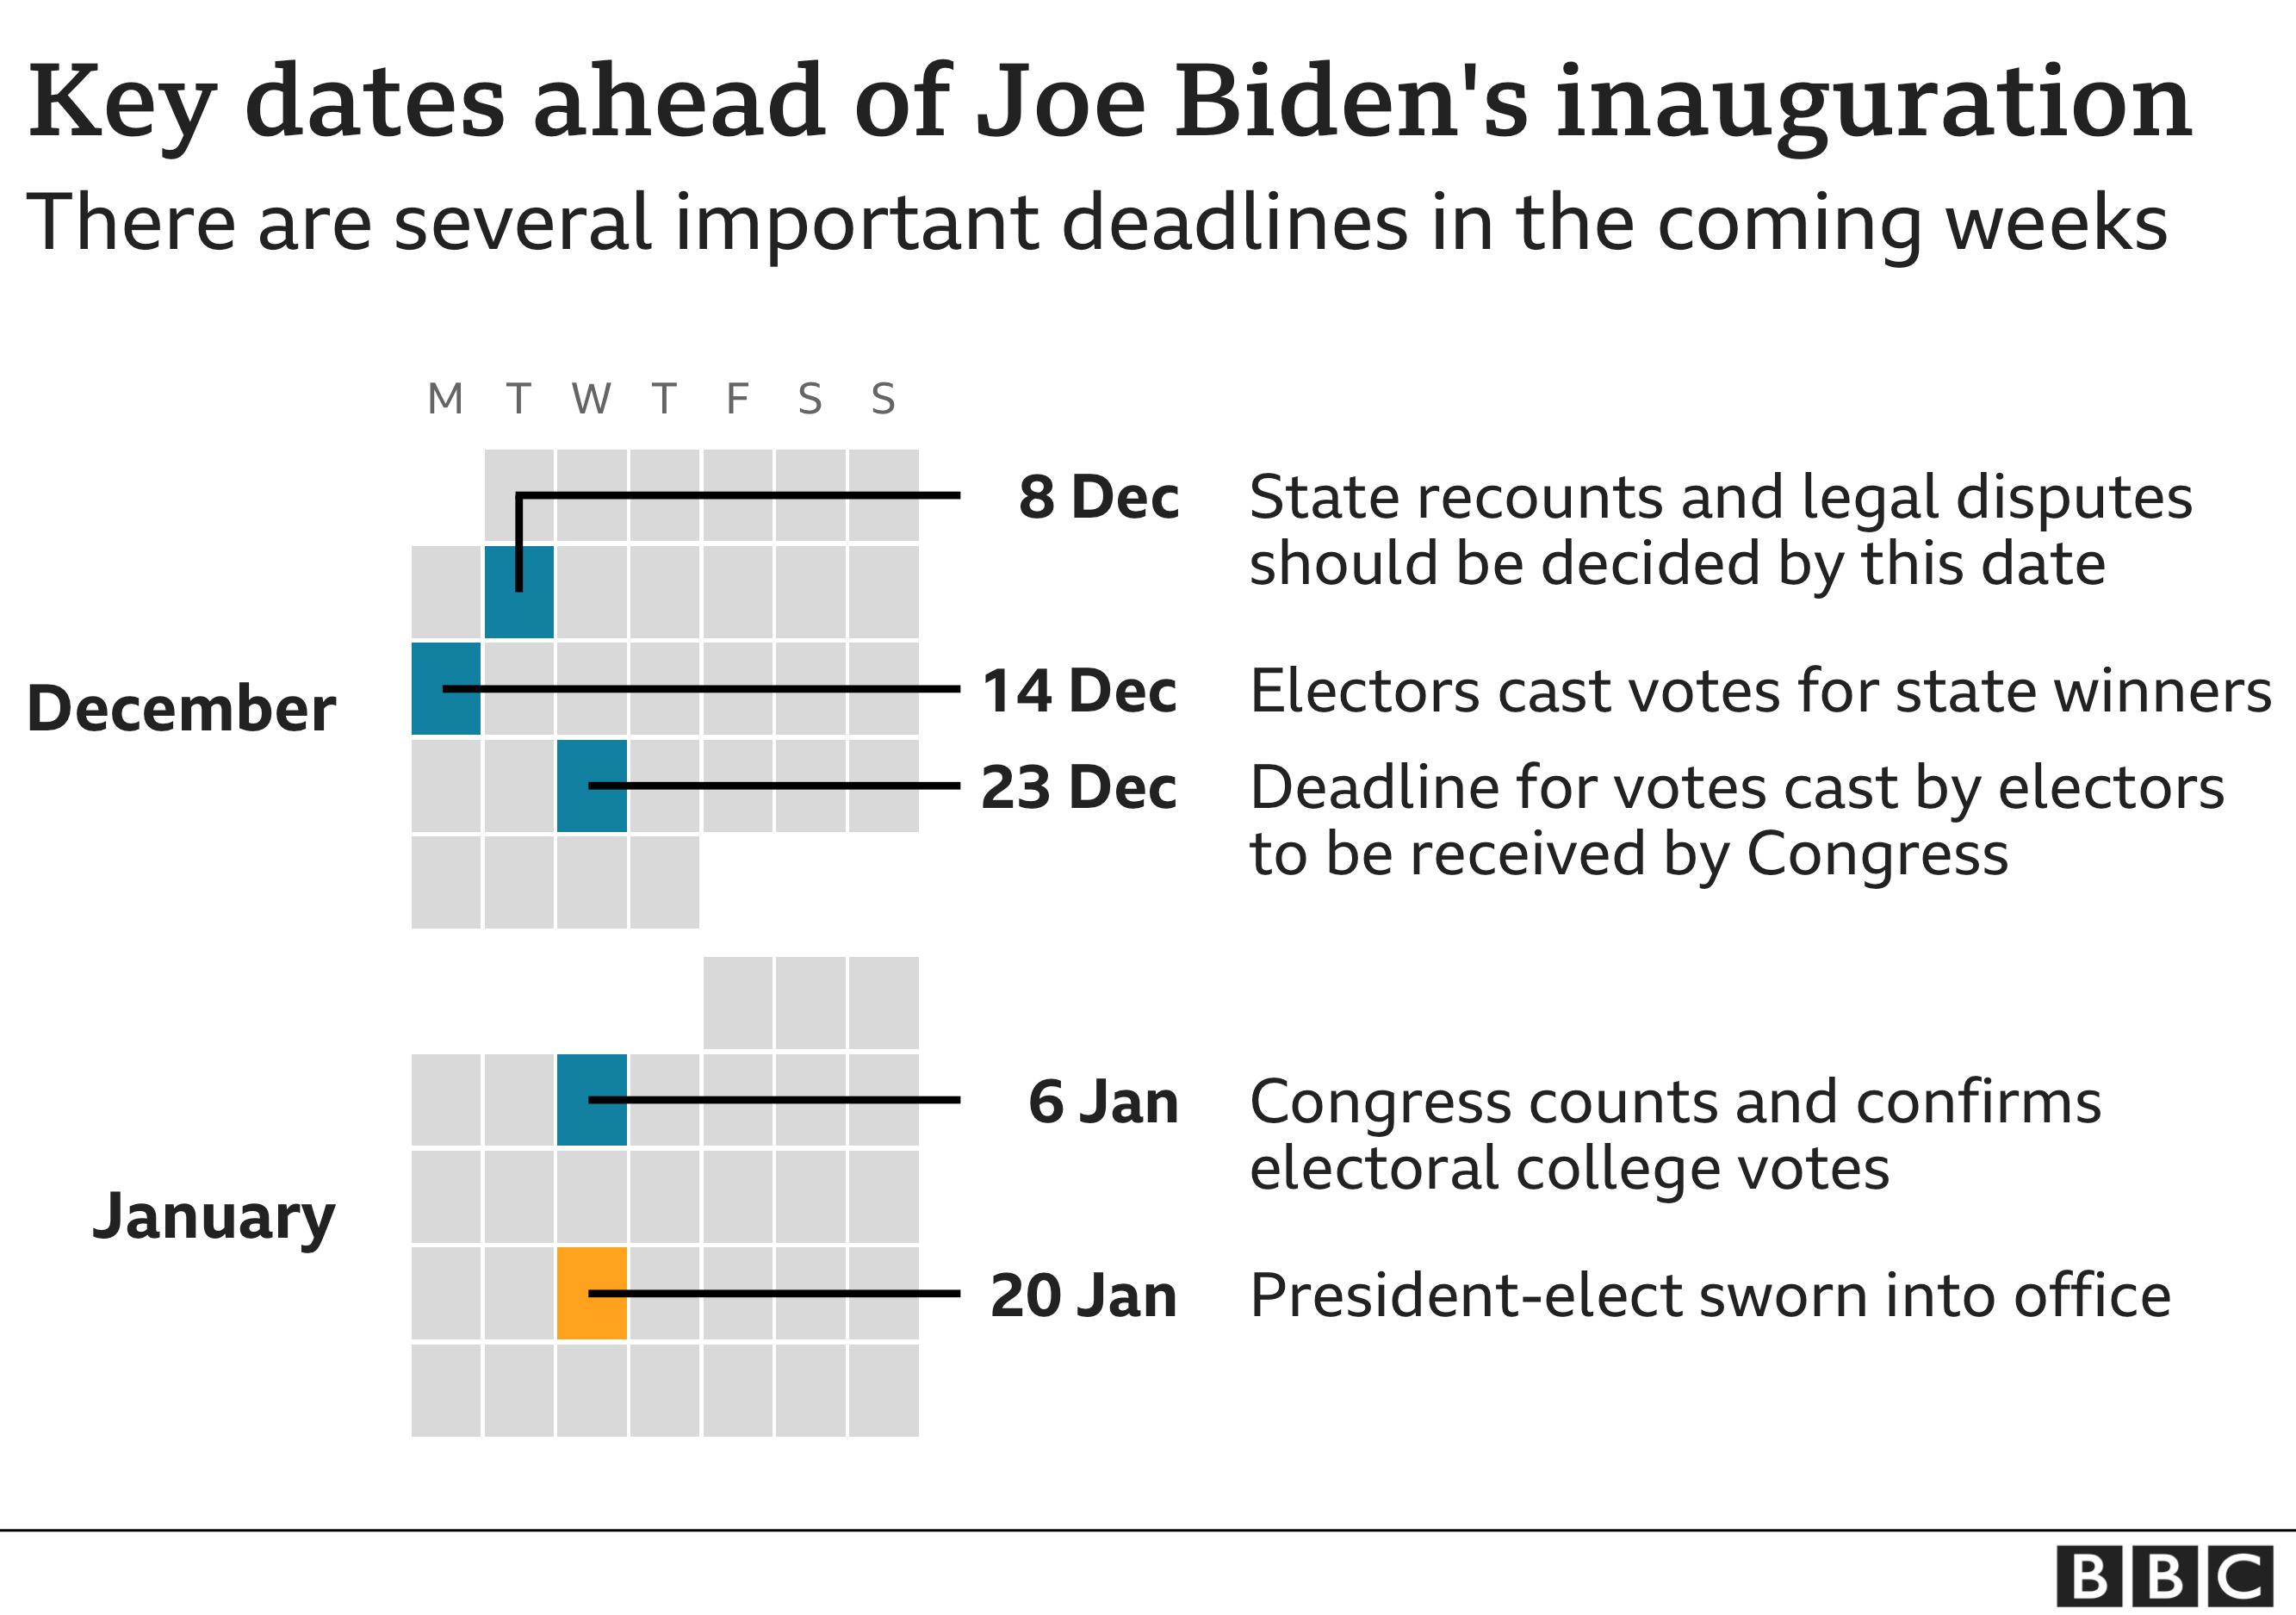 The key dates ahead of Joe Biden's inauguration